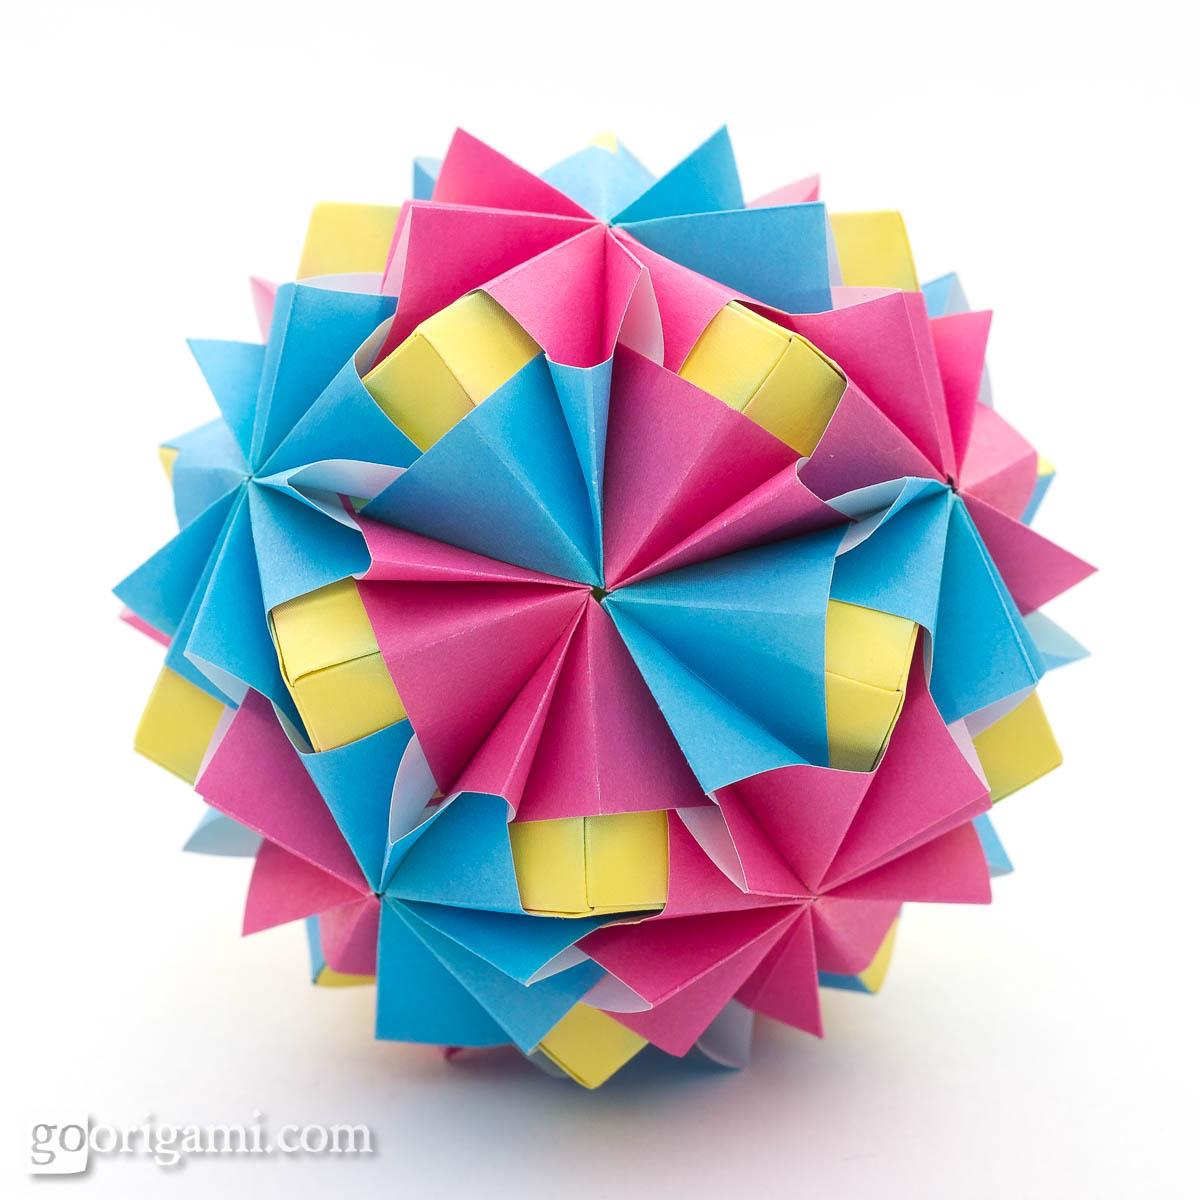 kusudama ball diagram traxxas grave digger parts waltz sonobe by maria sinayskaya  go origami